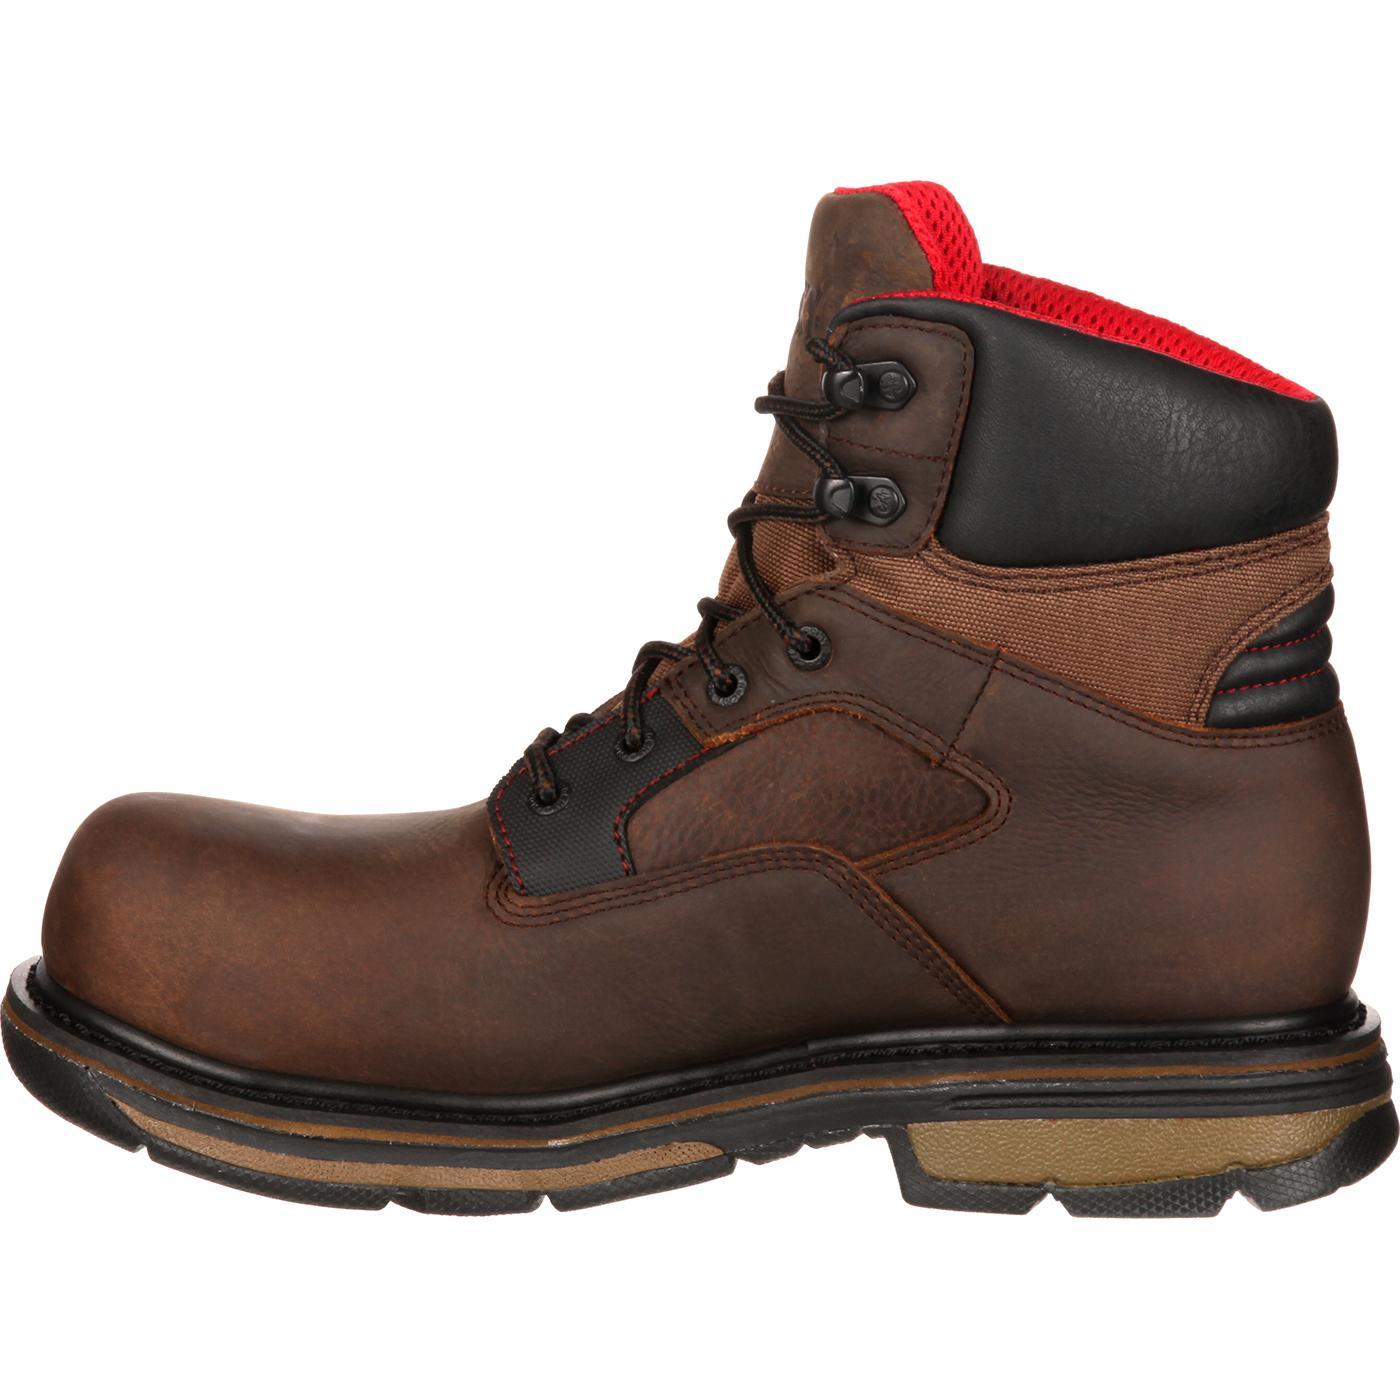 9281704023e4 Converse Work Composite Toe Cap Safety Shoes - Style Guru  Fashion ...